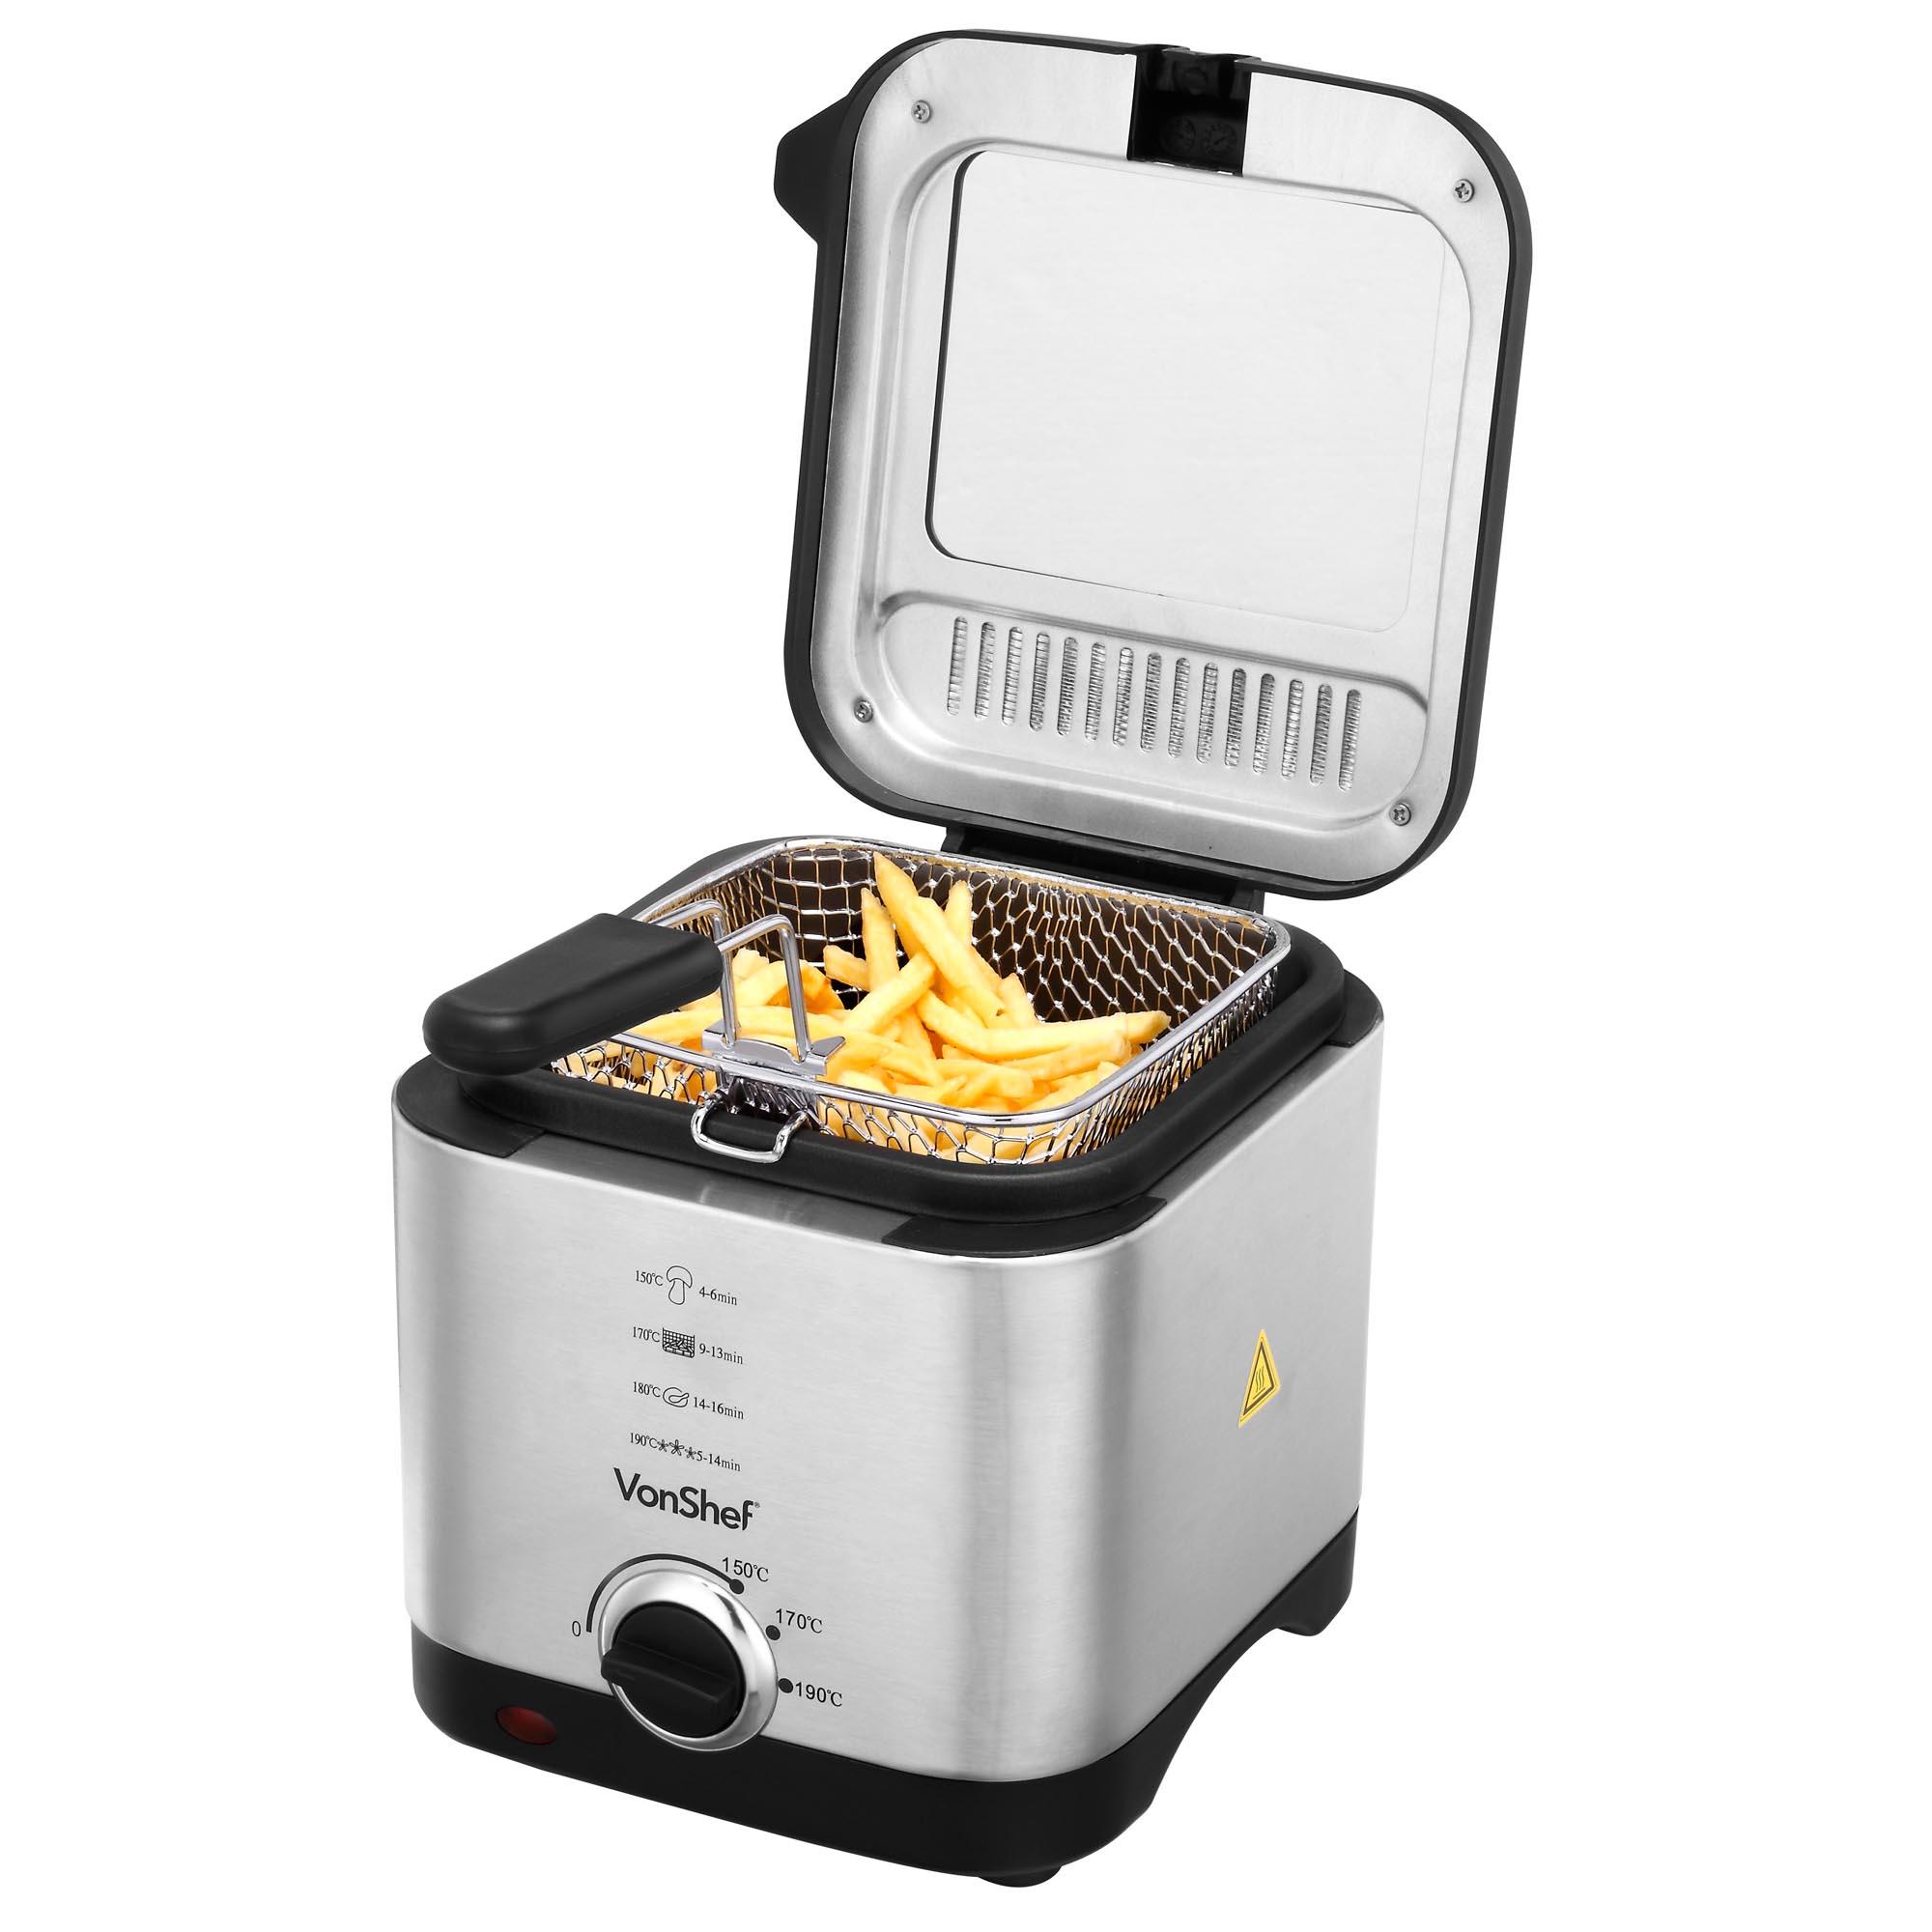 Vonshef Deep Fat Fryer 1 5 Litre Chip Pan Basket Non Stick